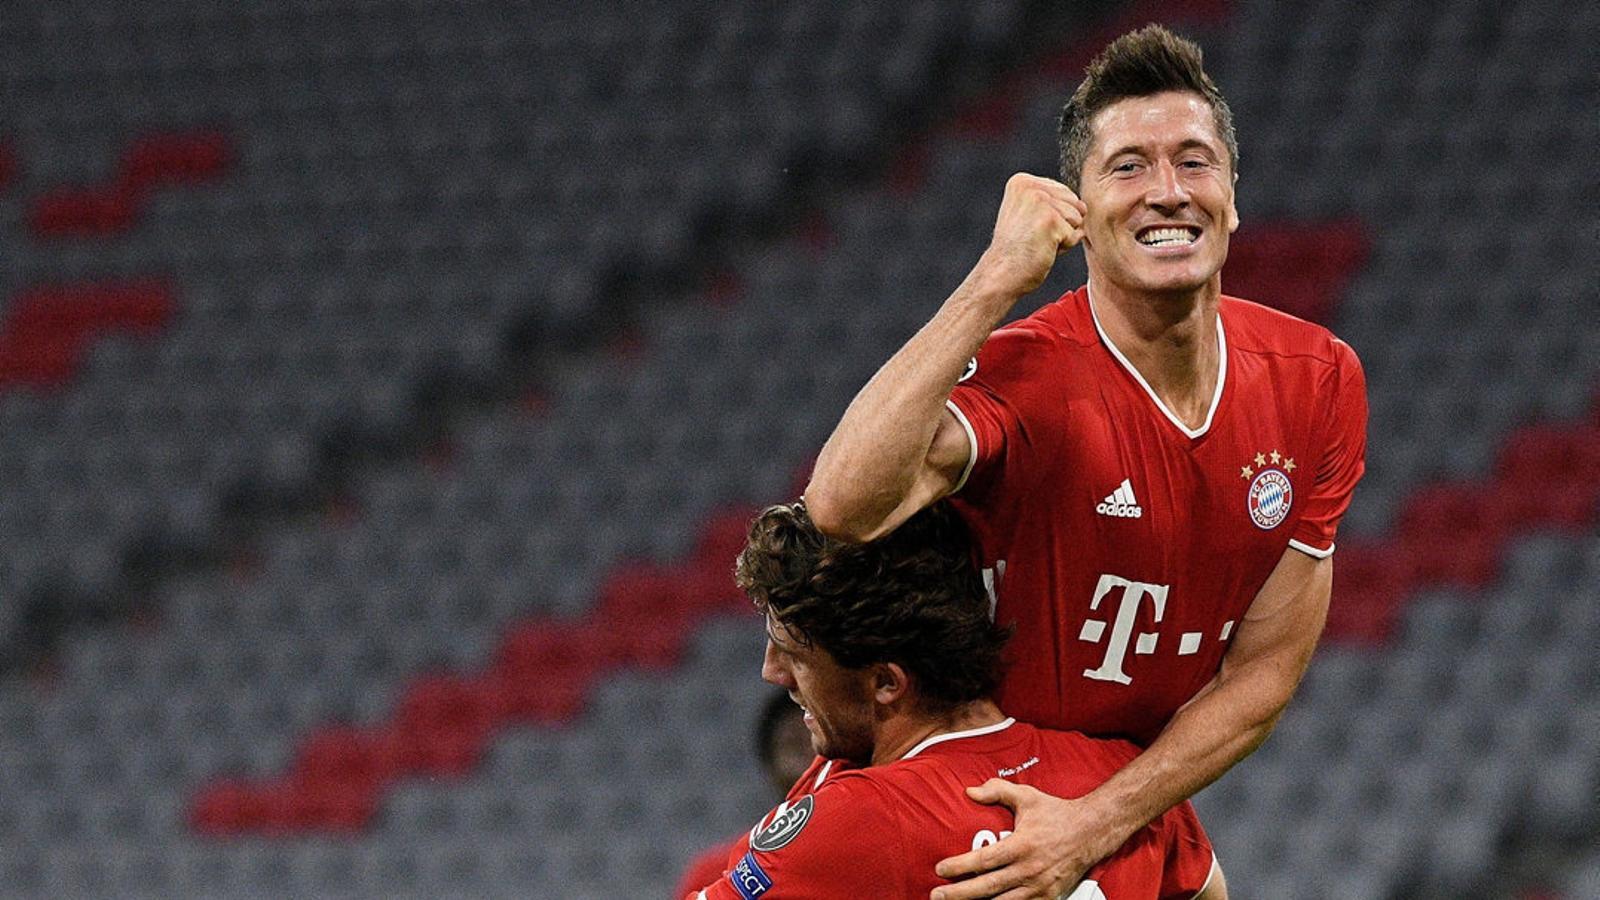 Barça i Bayern, on està prohibit perdre